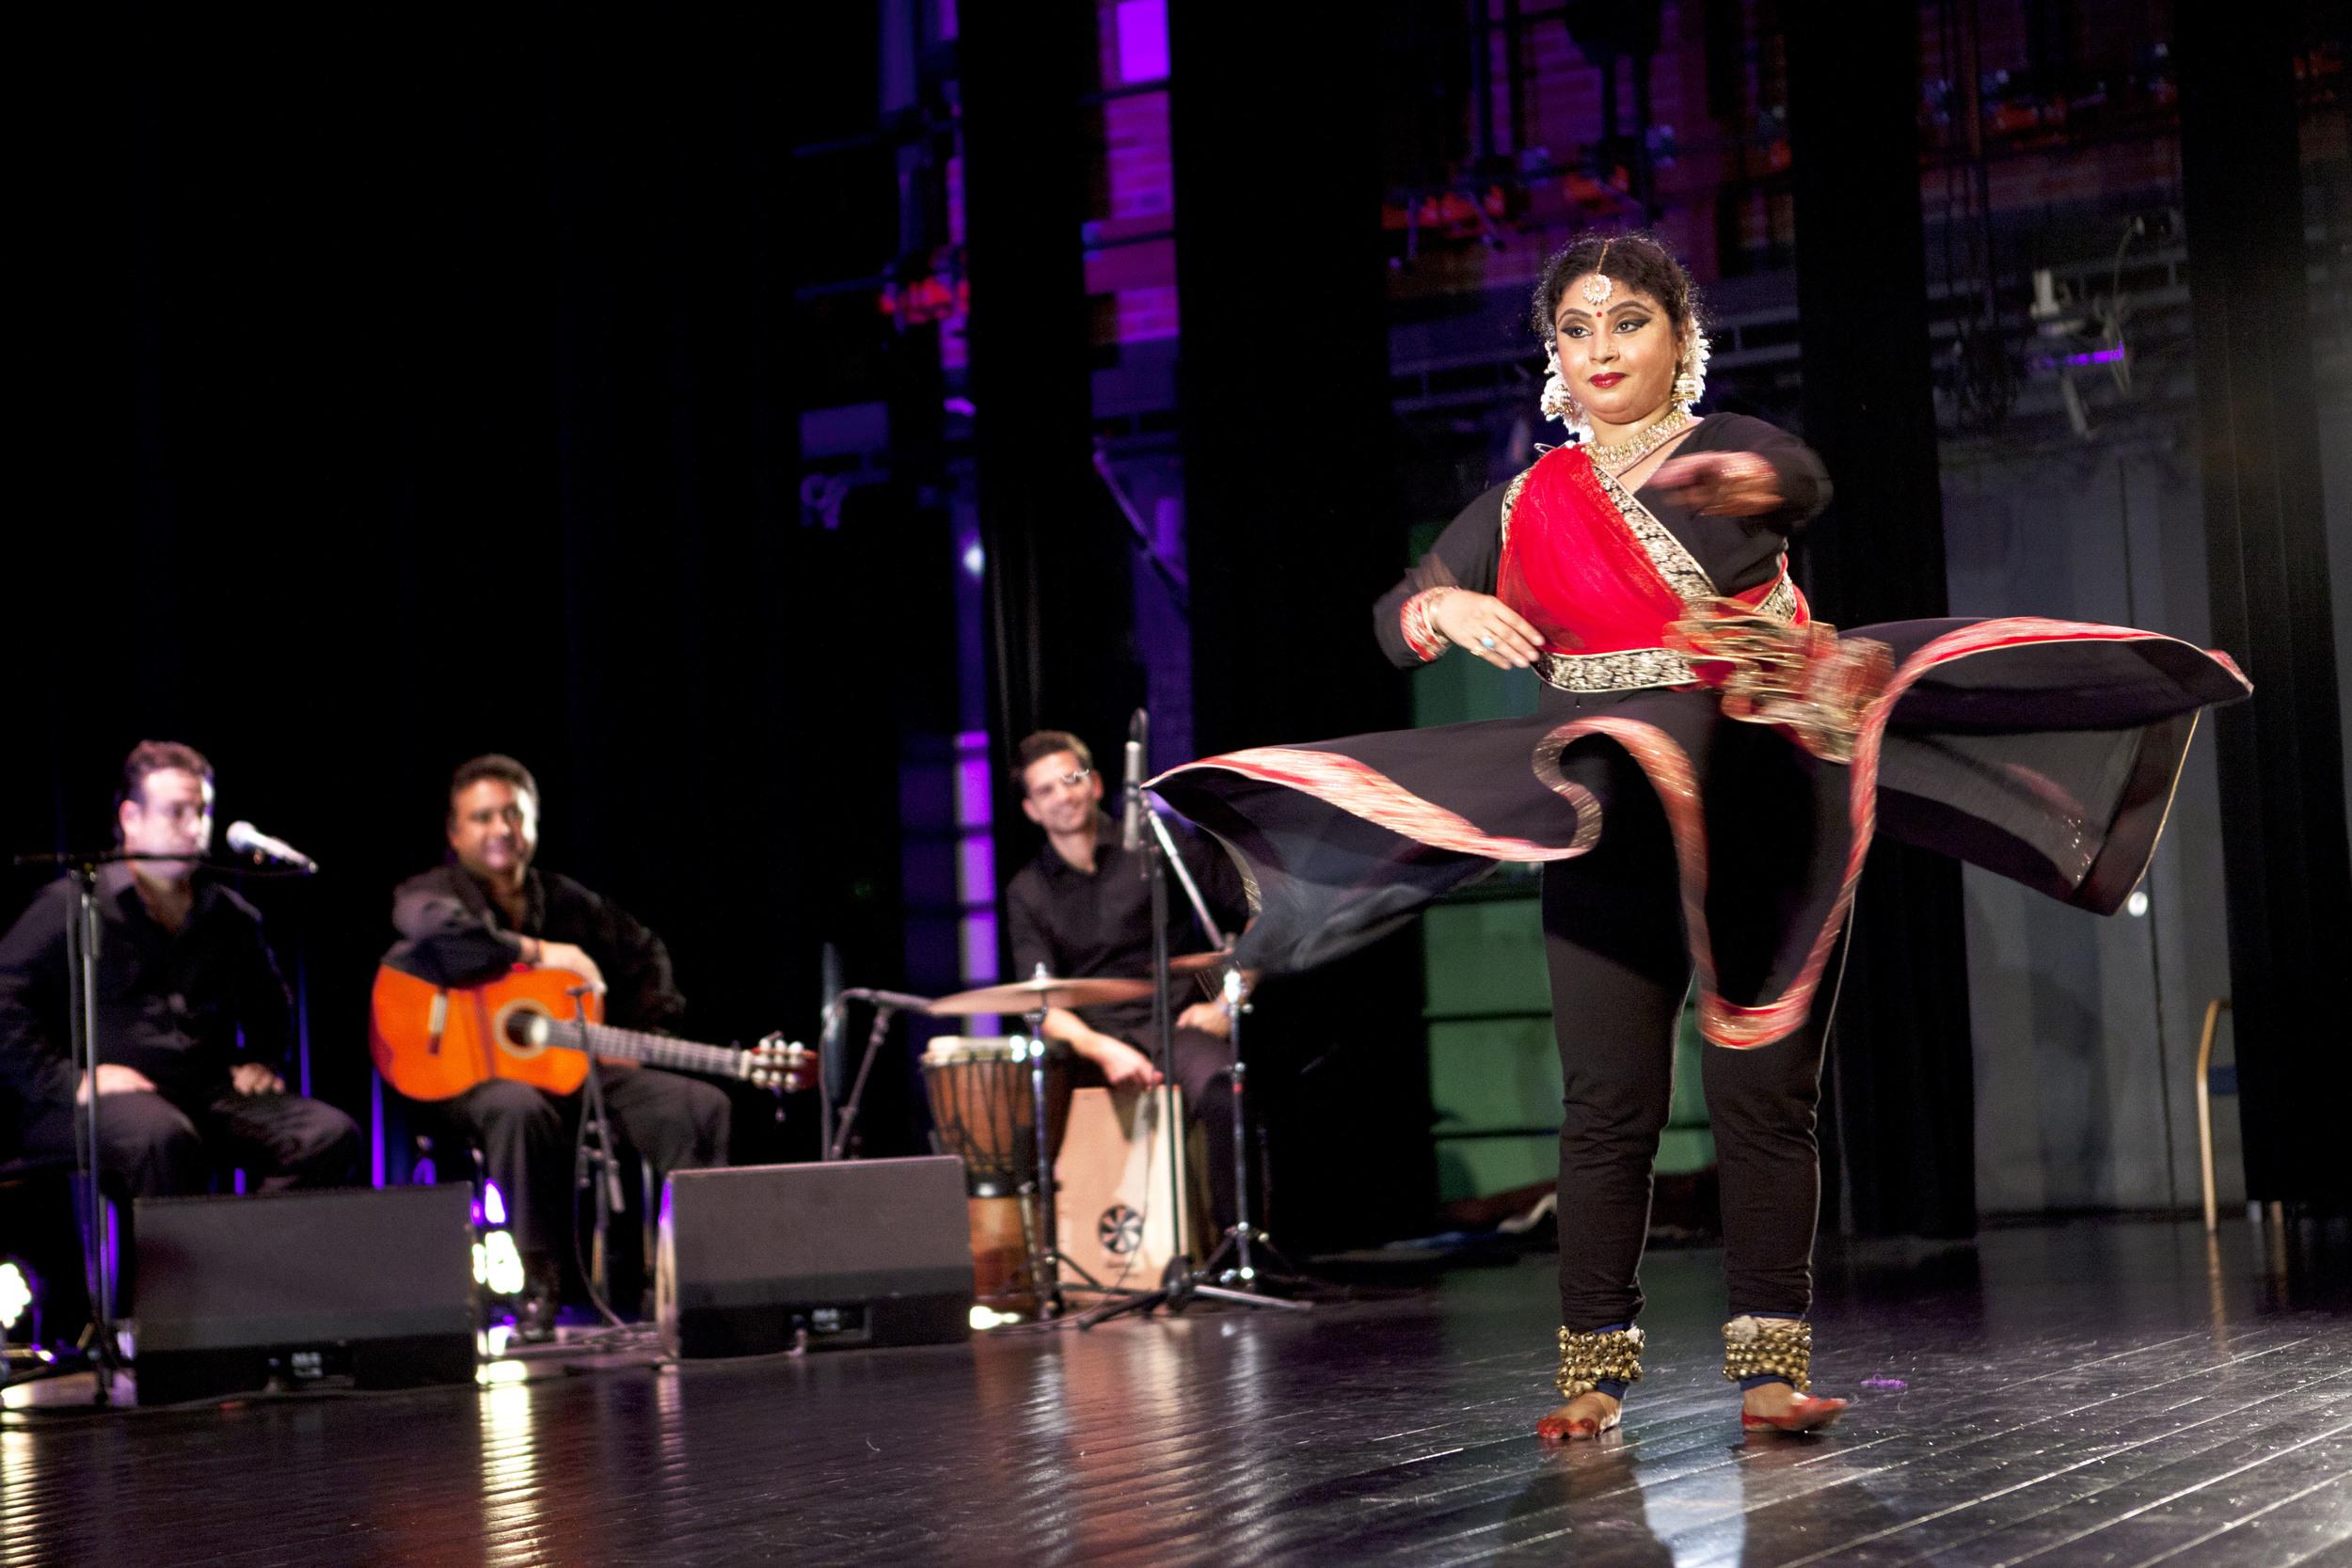 dance connections - pilar astola - teatersalen - 4. juli - heidi hattestein - IMG_5203.jpg